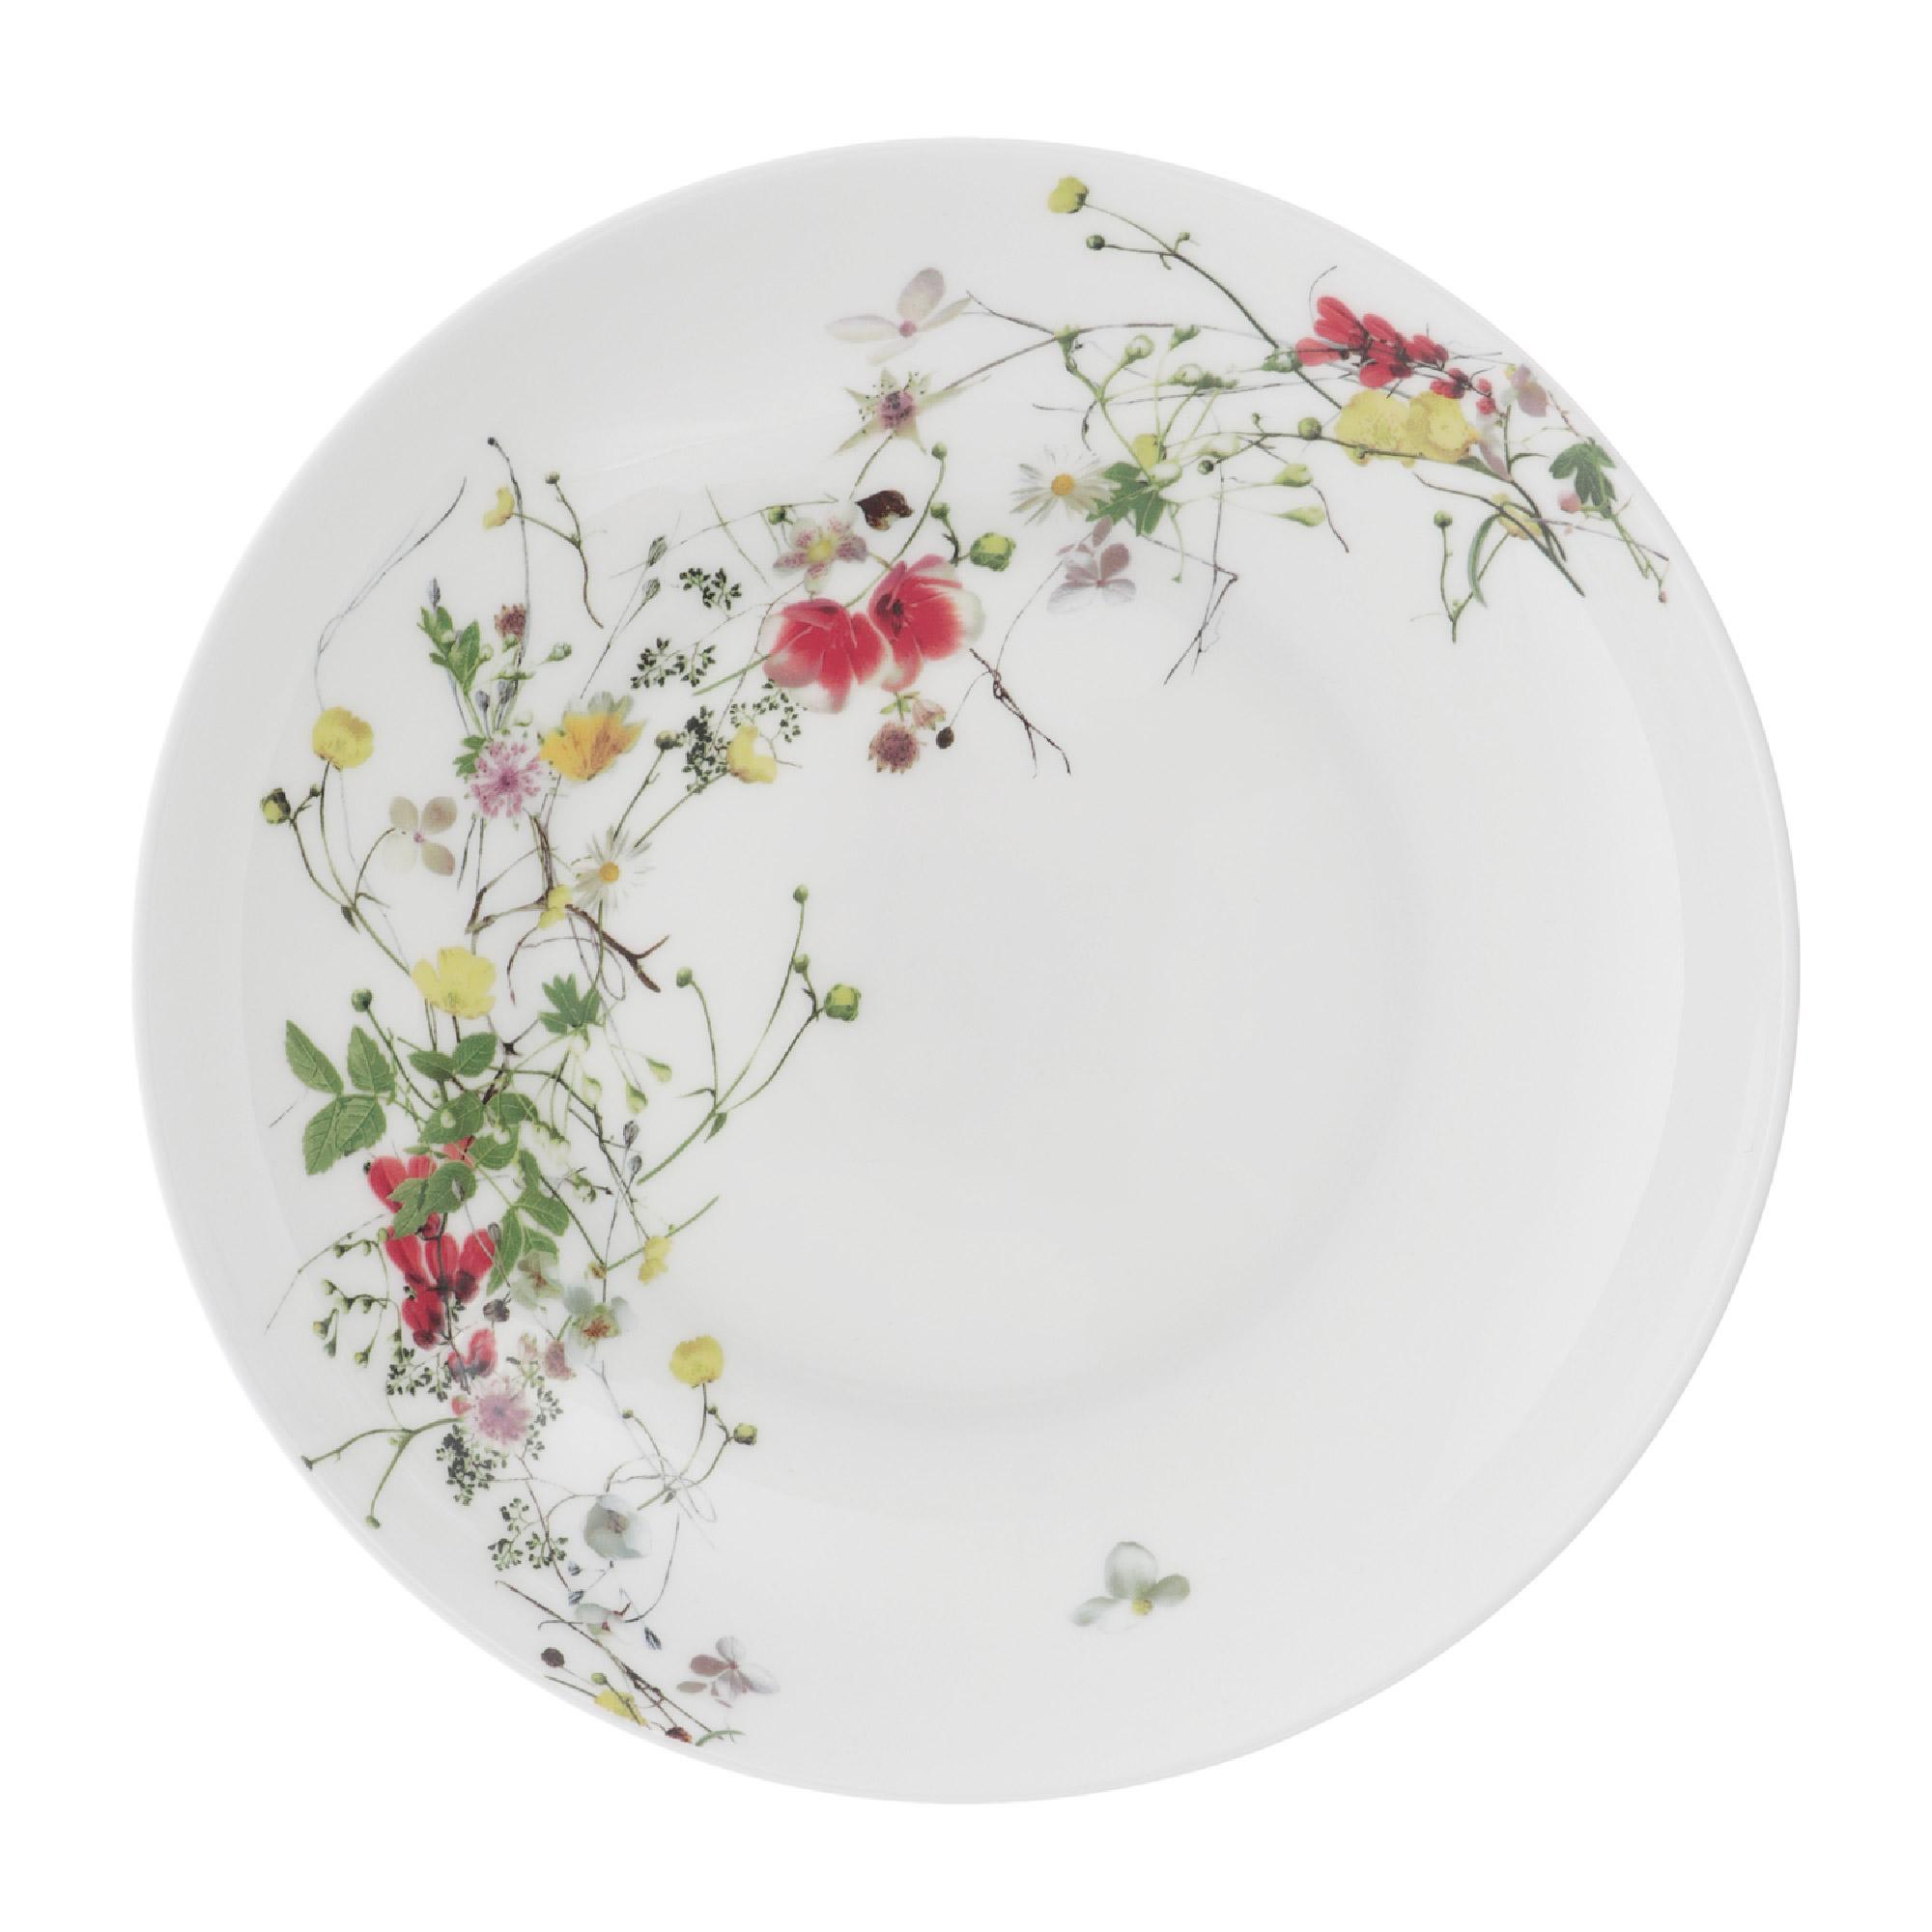 rosenthal selection brillance fleurs sauvages тарелка coup 27 см Тарелка подстановочная 32см Rosenthal дикие цветы